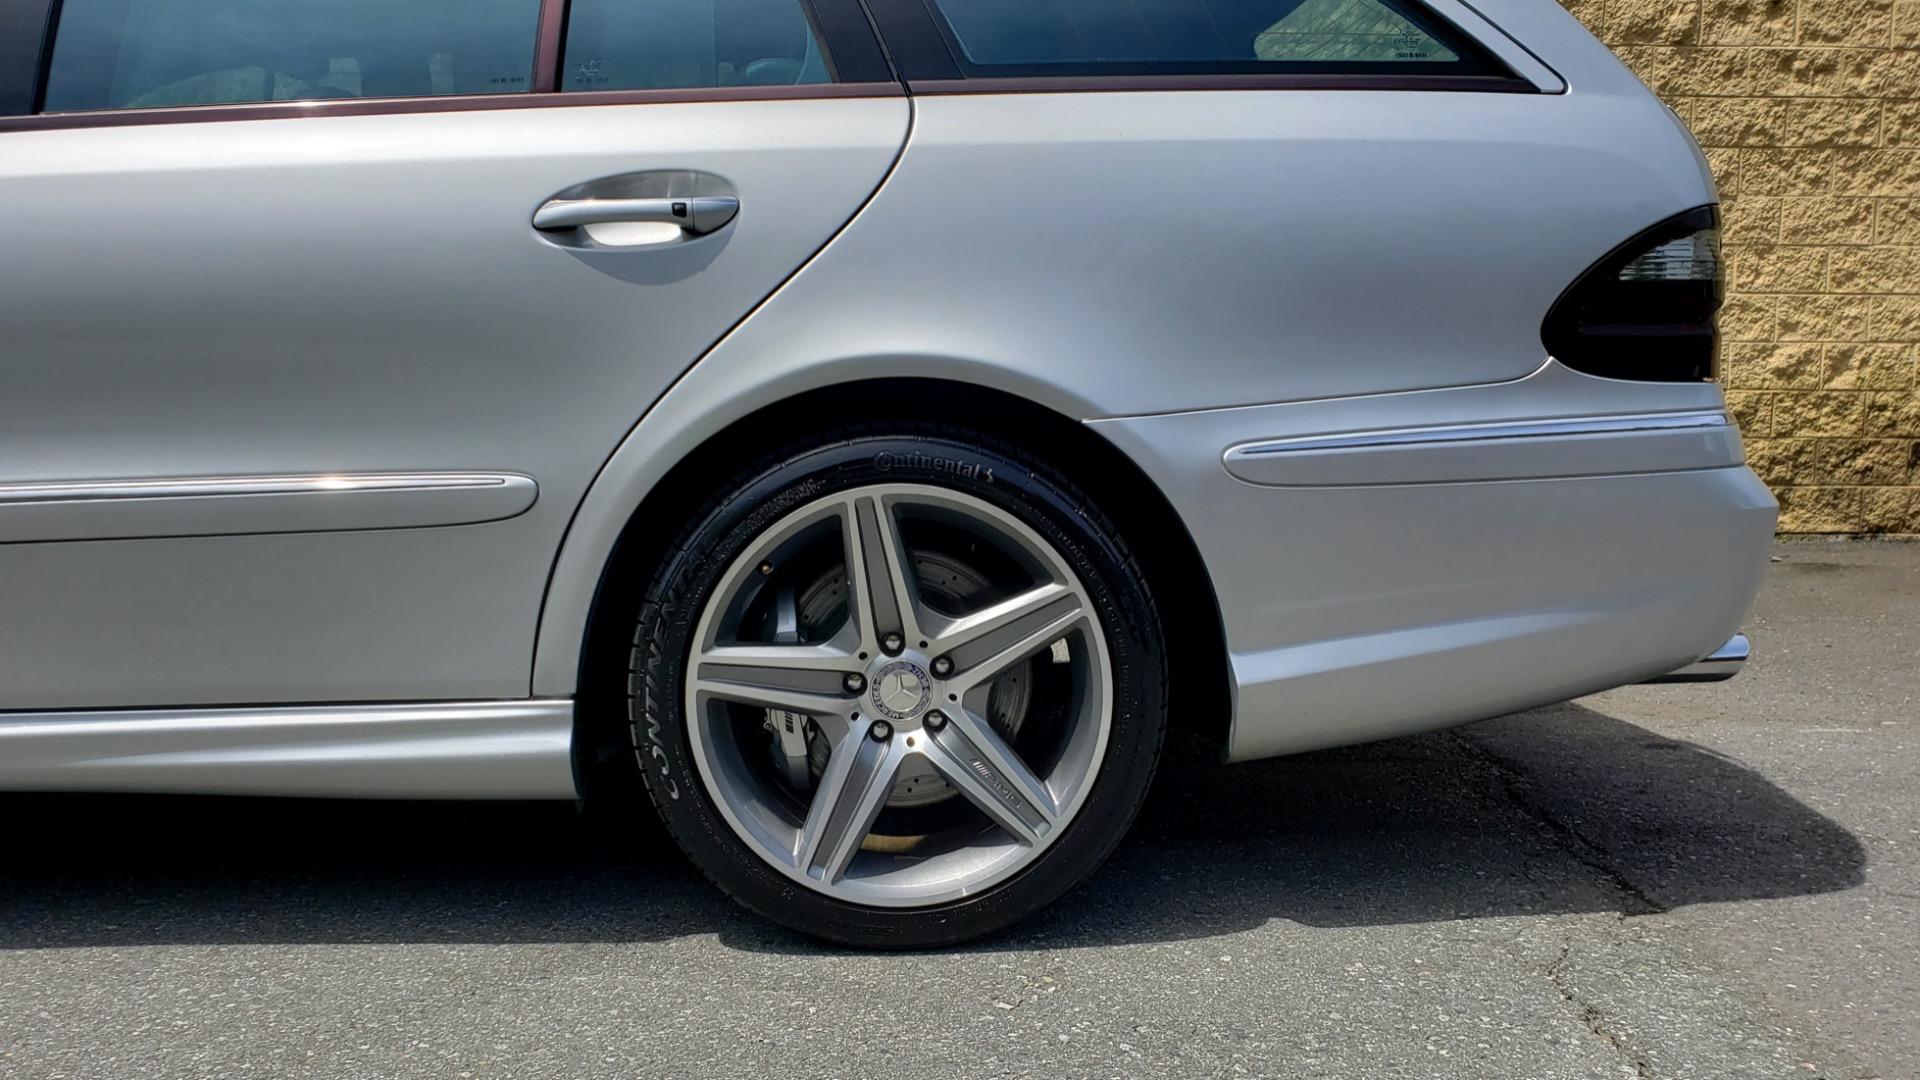 Used 2007 Mercedes-Benz E-Class E63 AMG WAGON / NAV / SUNROOF / HARMAN/KARDON for sale $29,000 at Formula Imports in Charlotte NC 28227 83